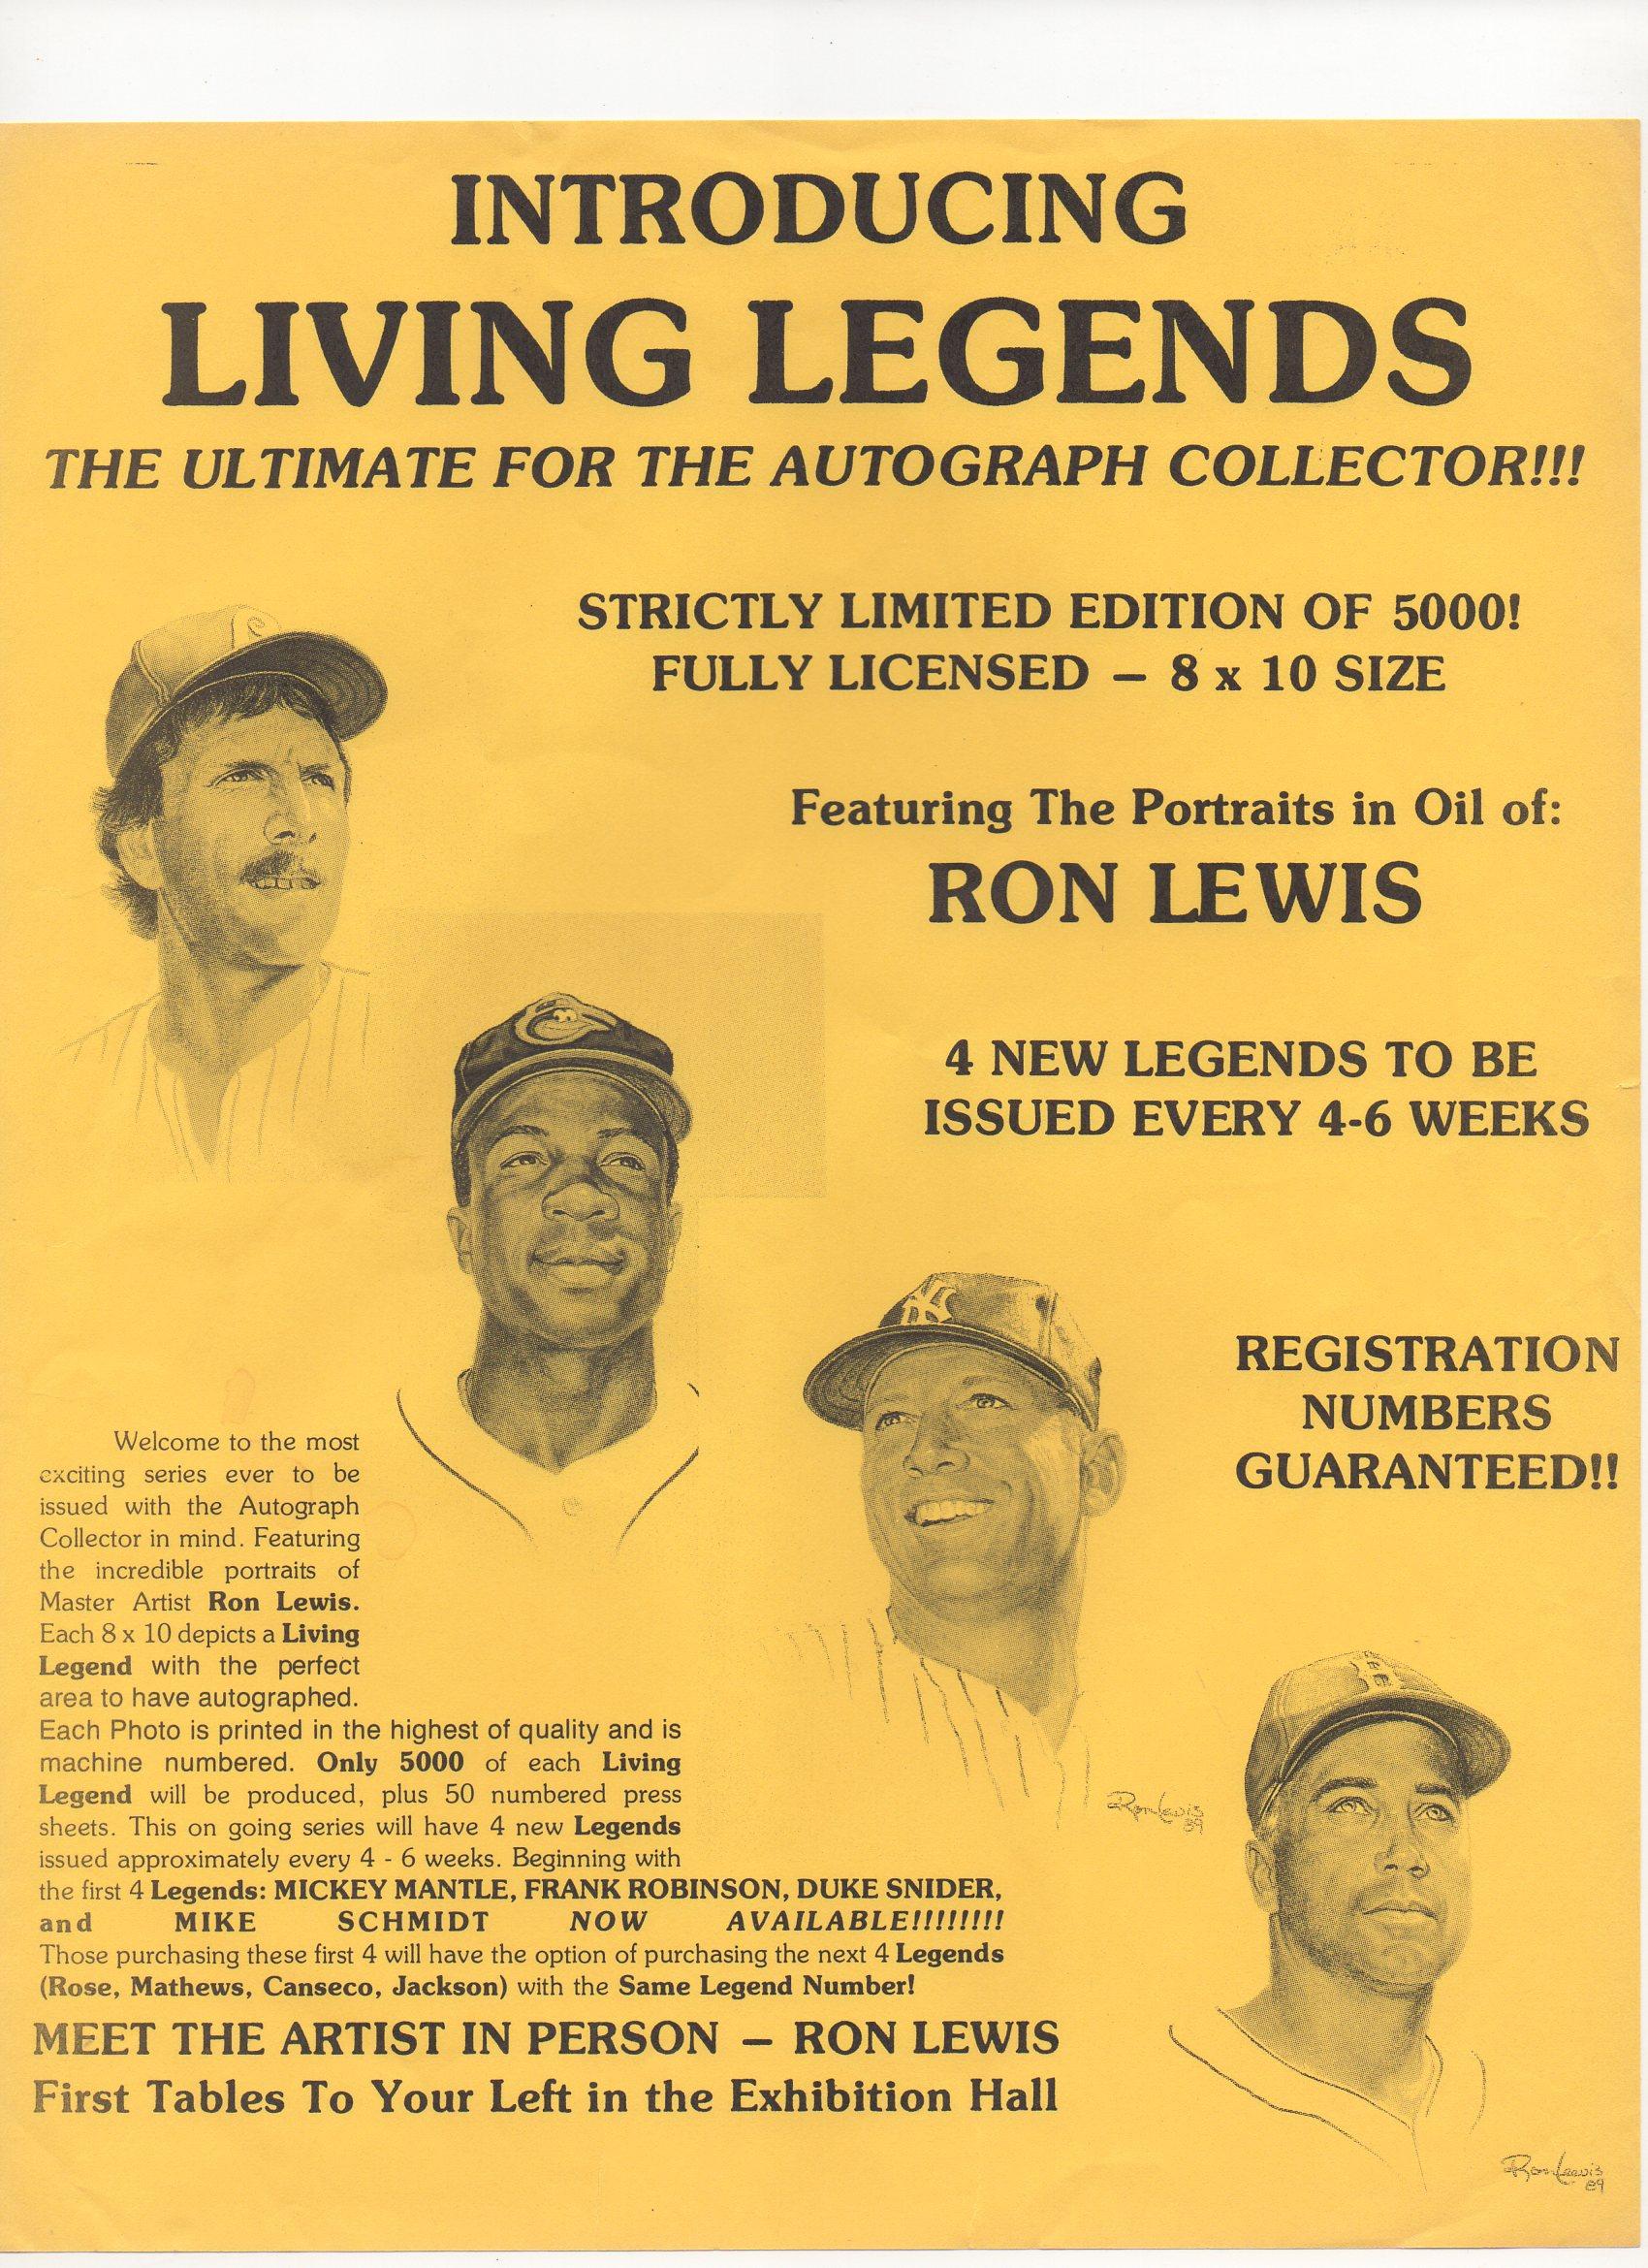 1989-90 flyer